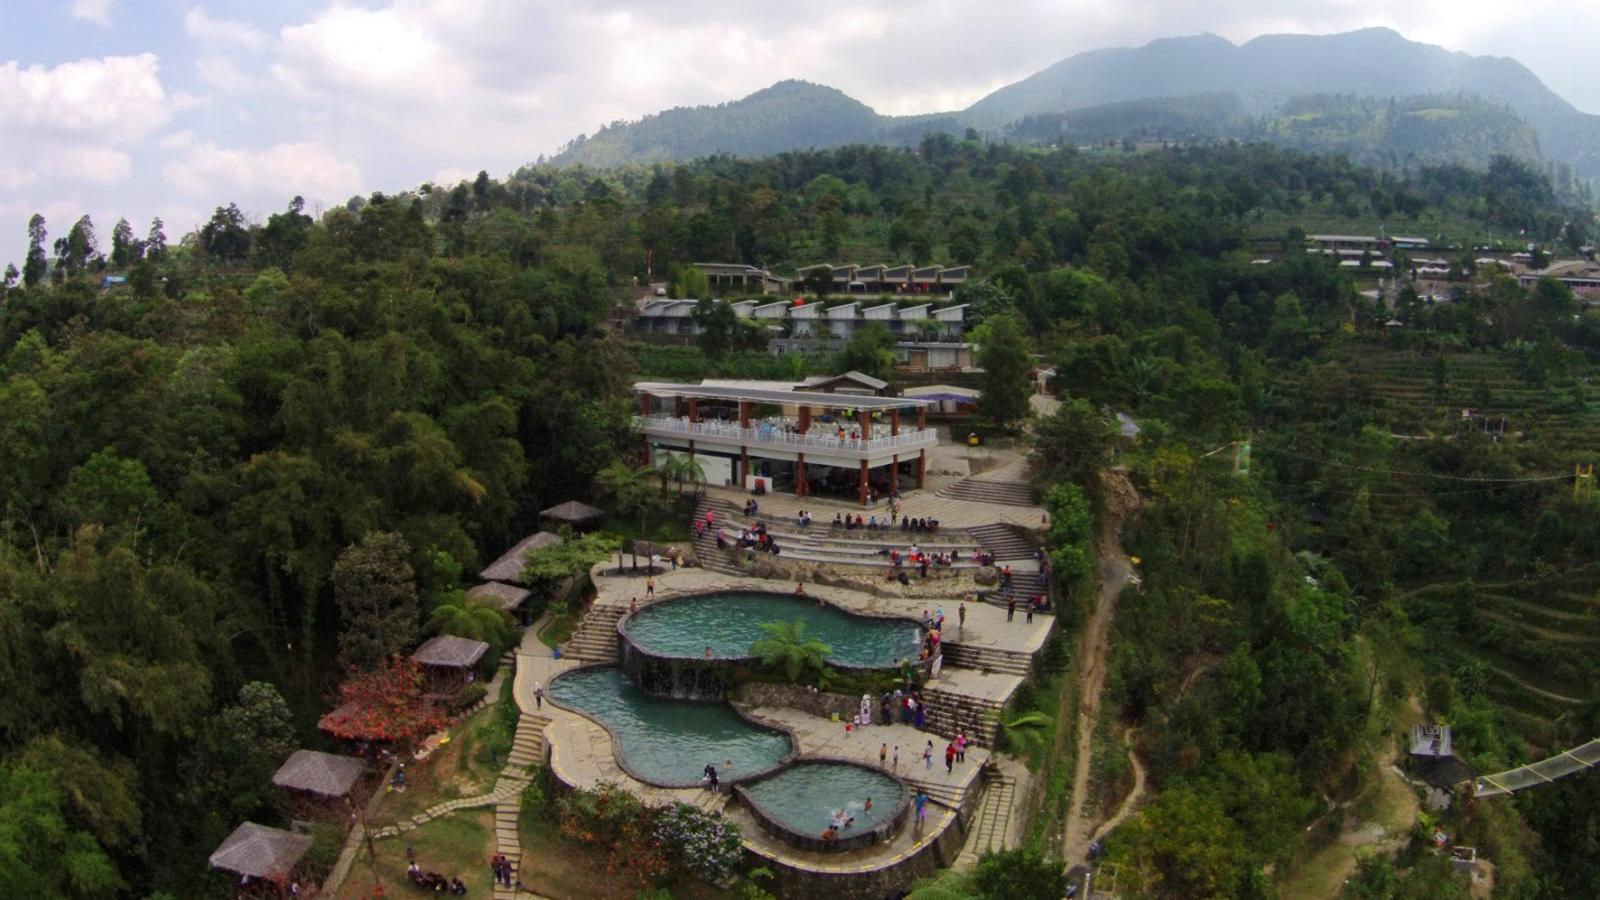 Tempat wisata di Semarang - Umbul Sidomukti